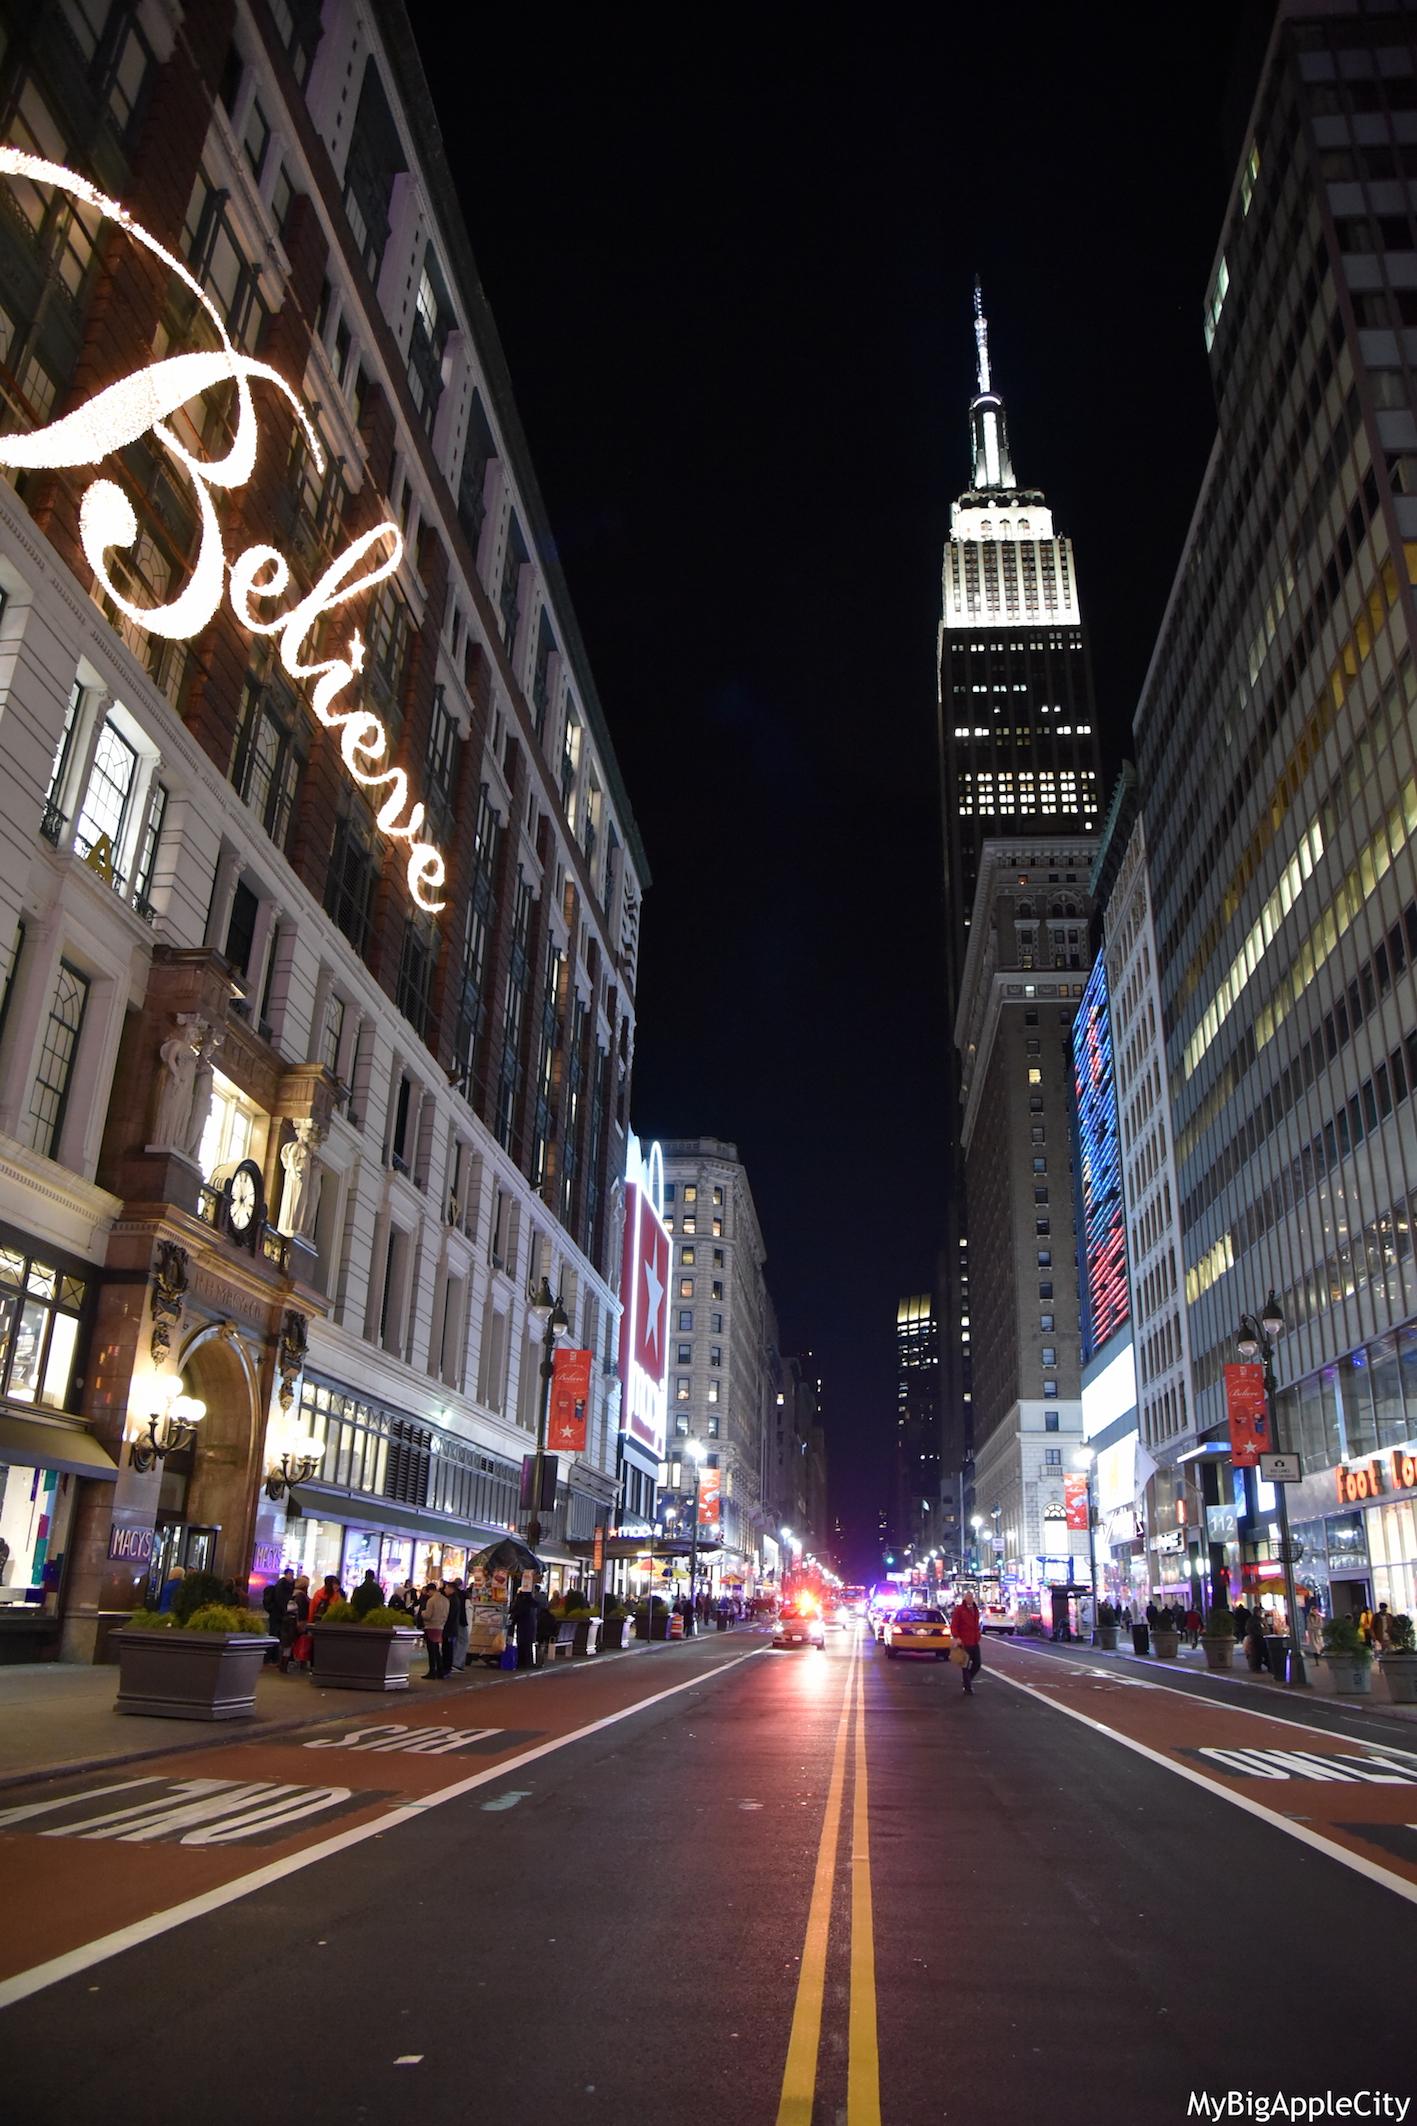 Christmas-Holiday-New-York-34th-street-MyBigAppleCity